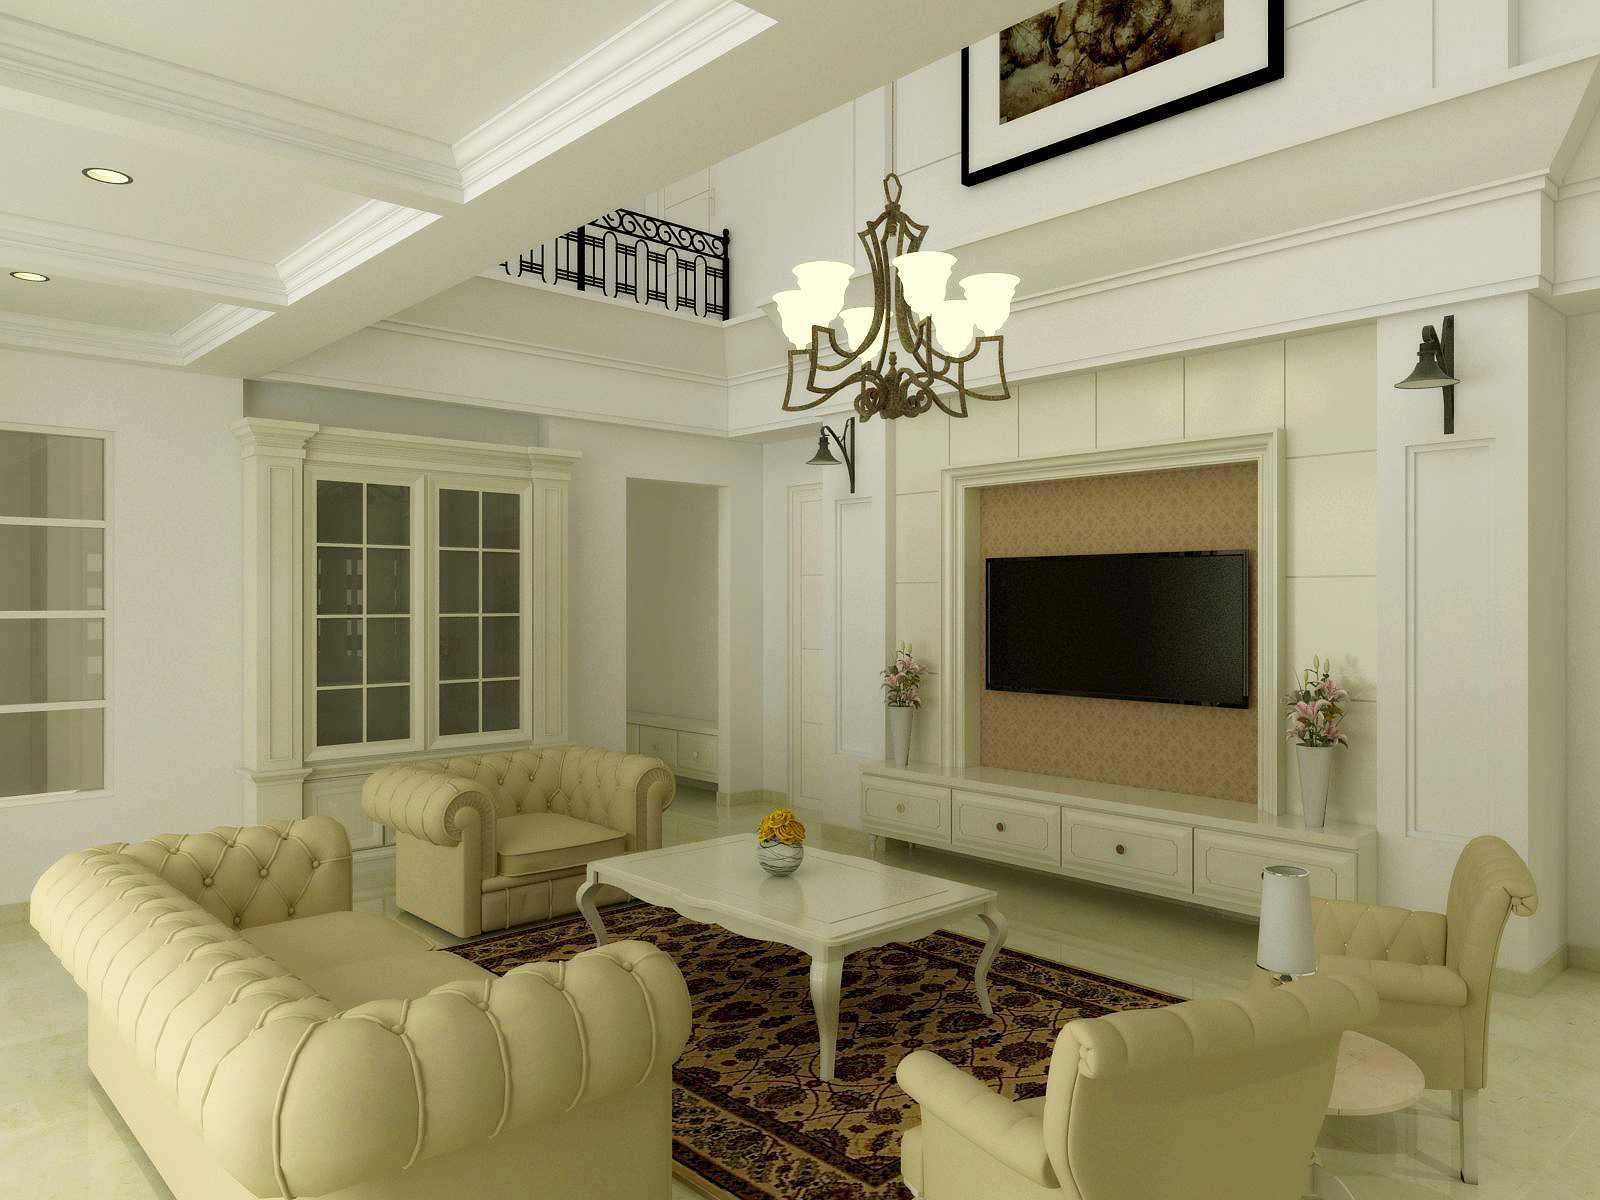 Tama Techtonica Tebet Classic Jakarta Jakarta Livingroom Klasik,modern  13634